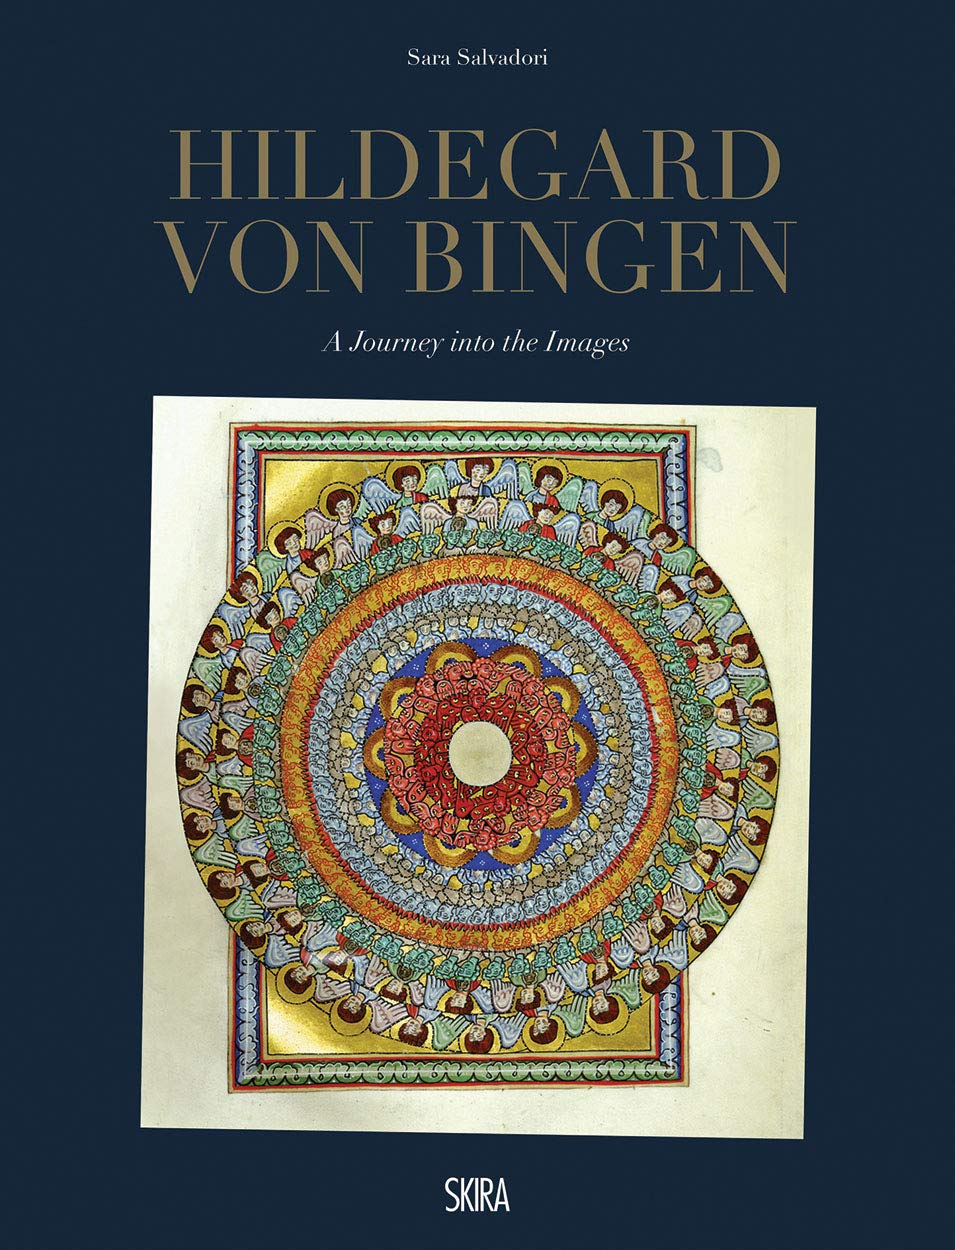 Hildegard von Bingen: A Journey into the Images by Skira